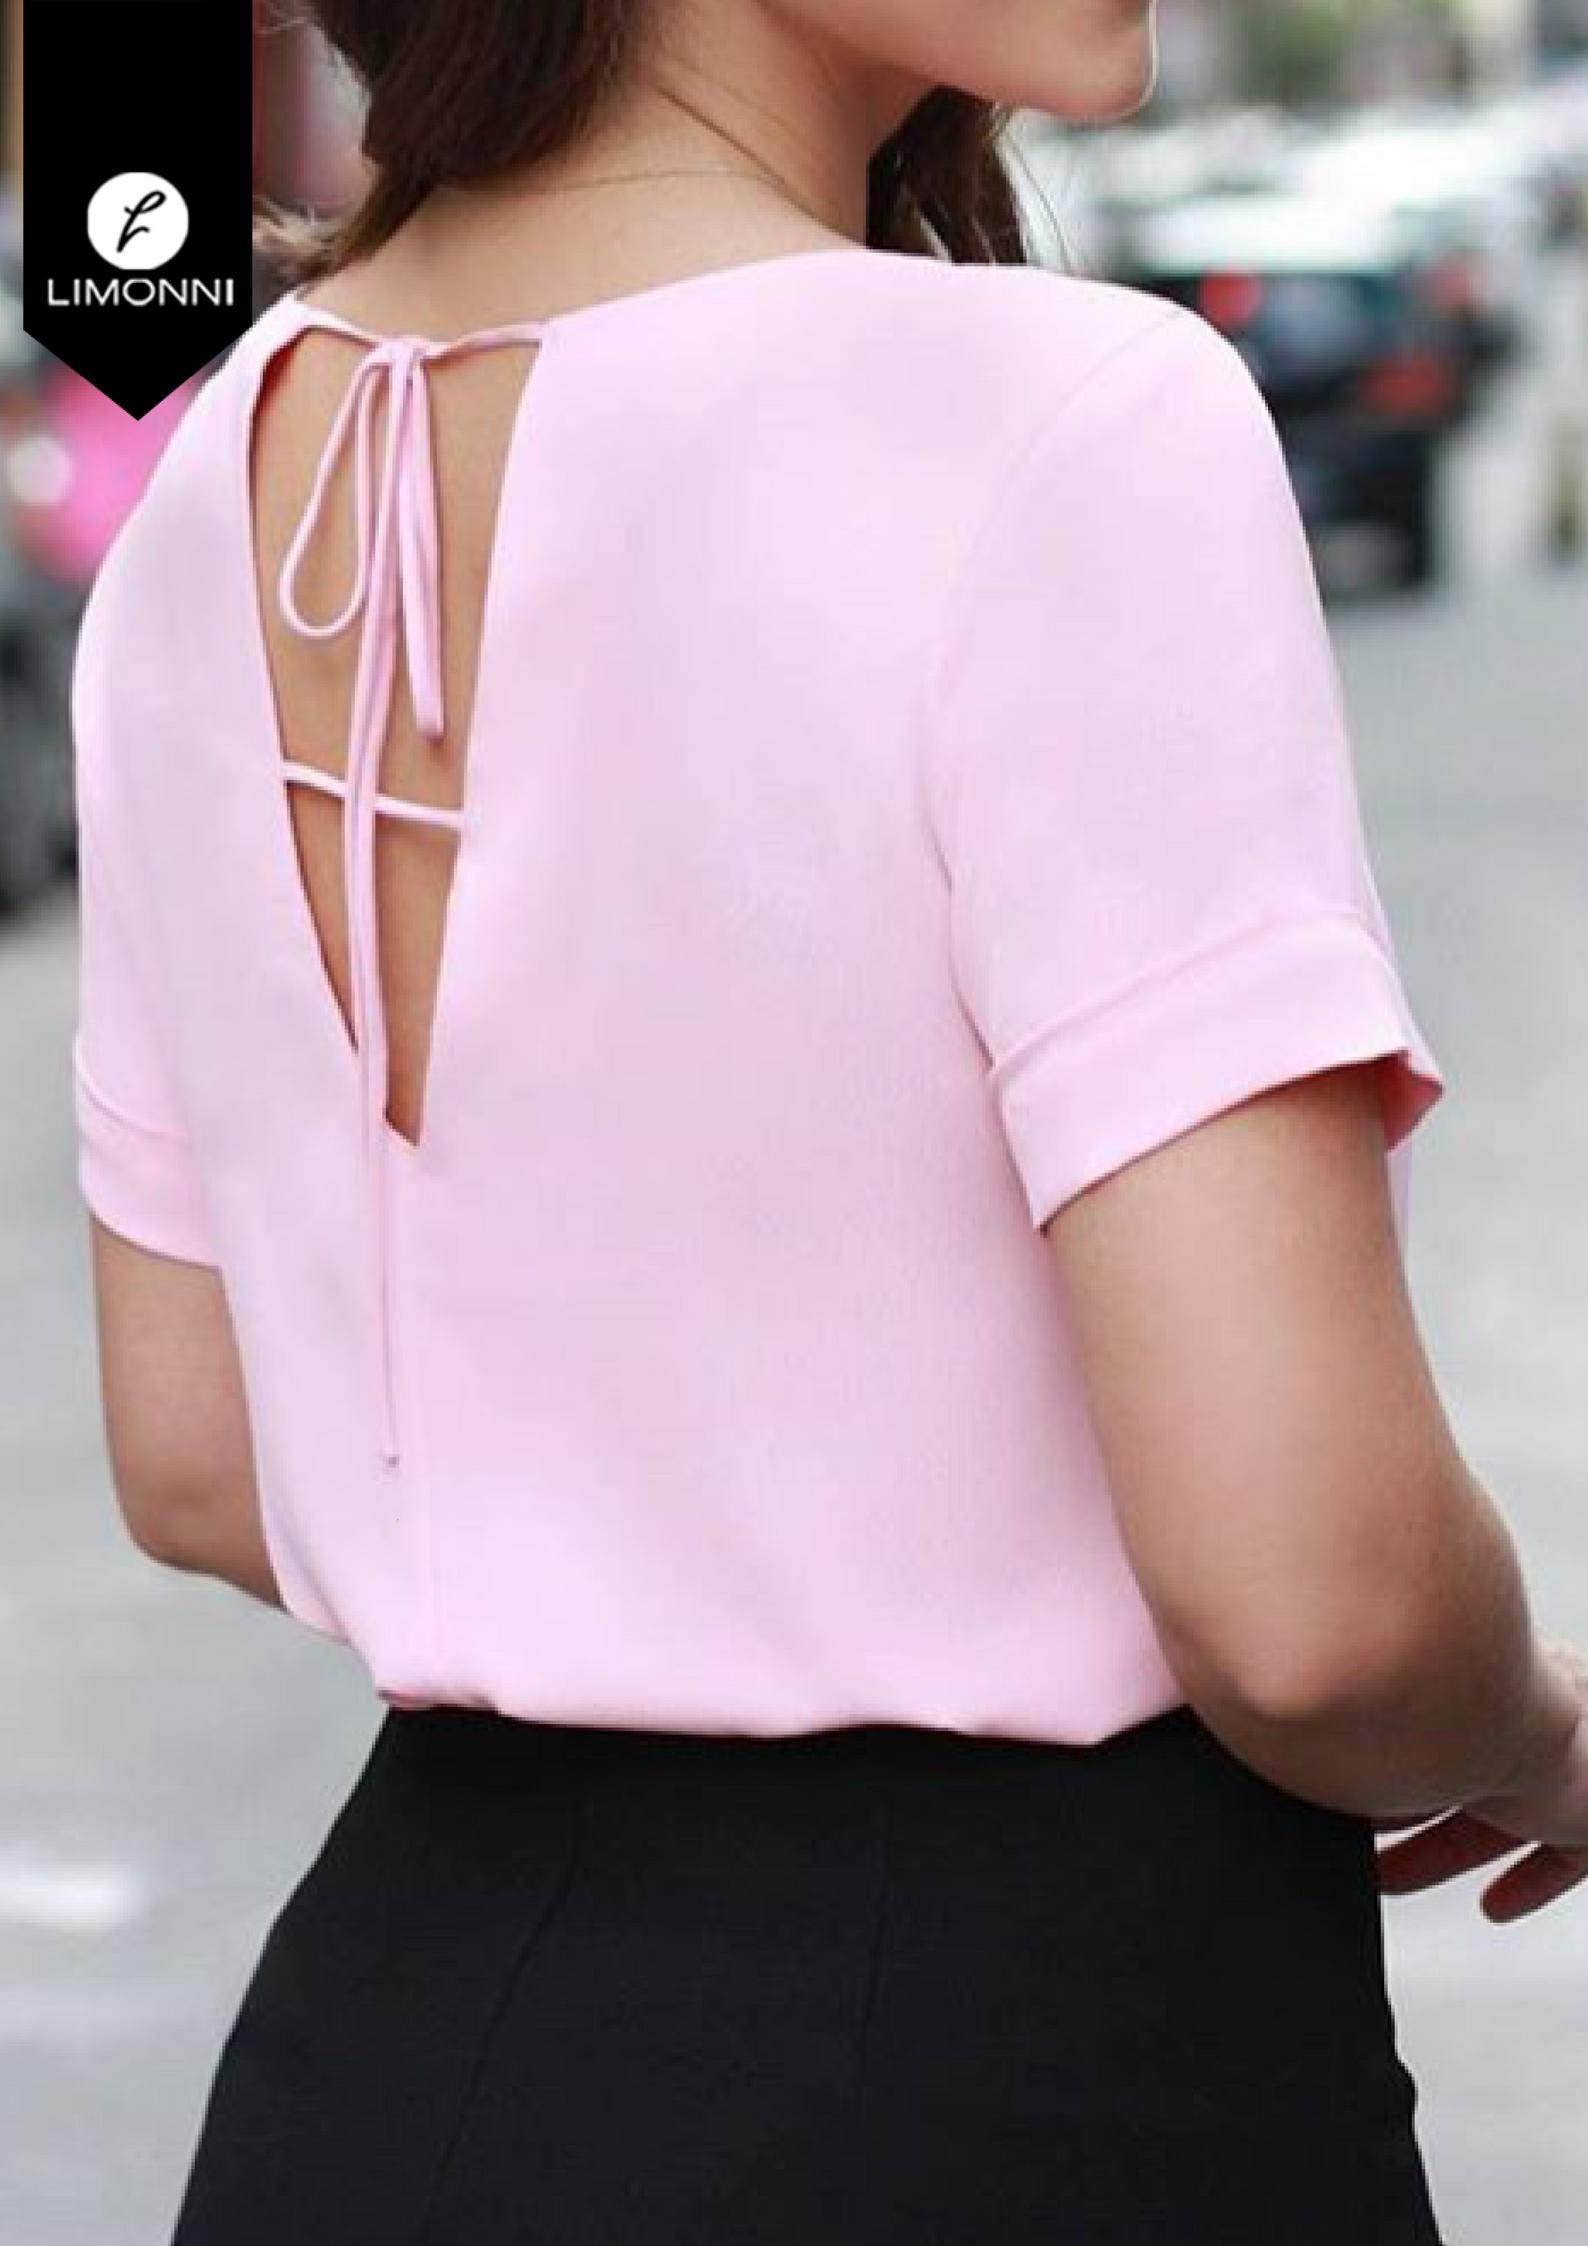 Blusas para mujer Limonni Bennett LI1337 Casuales